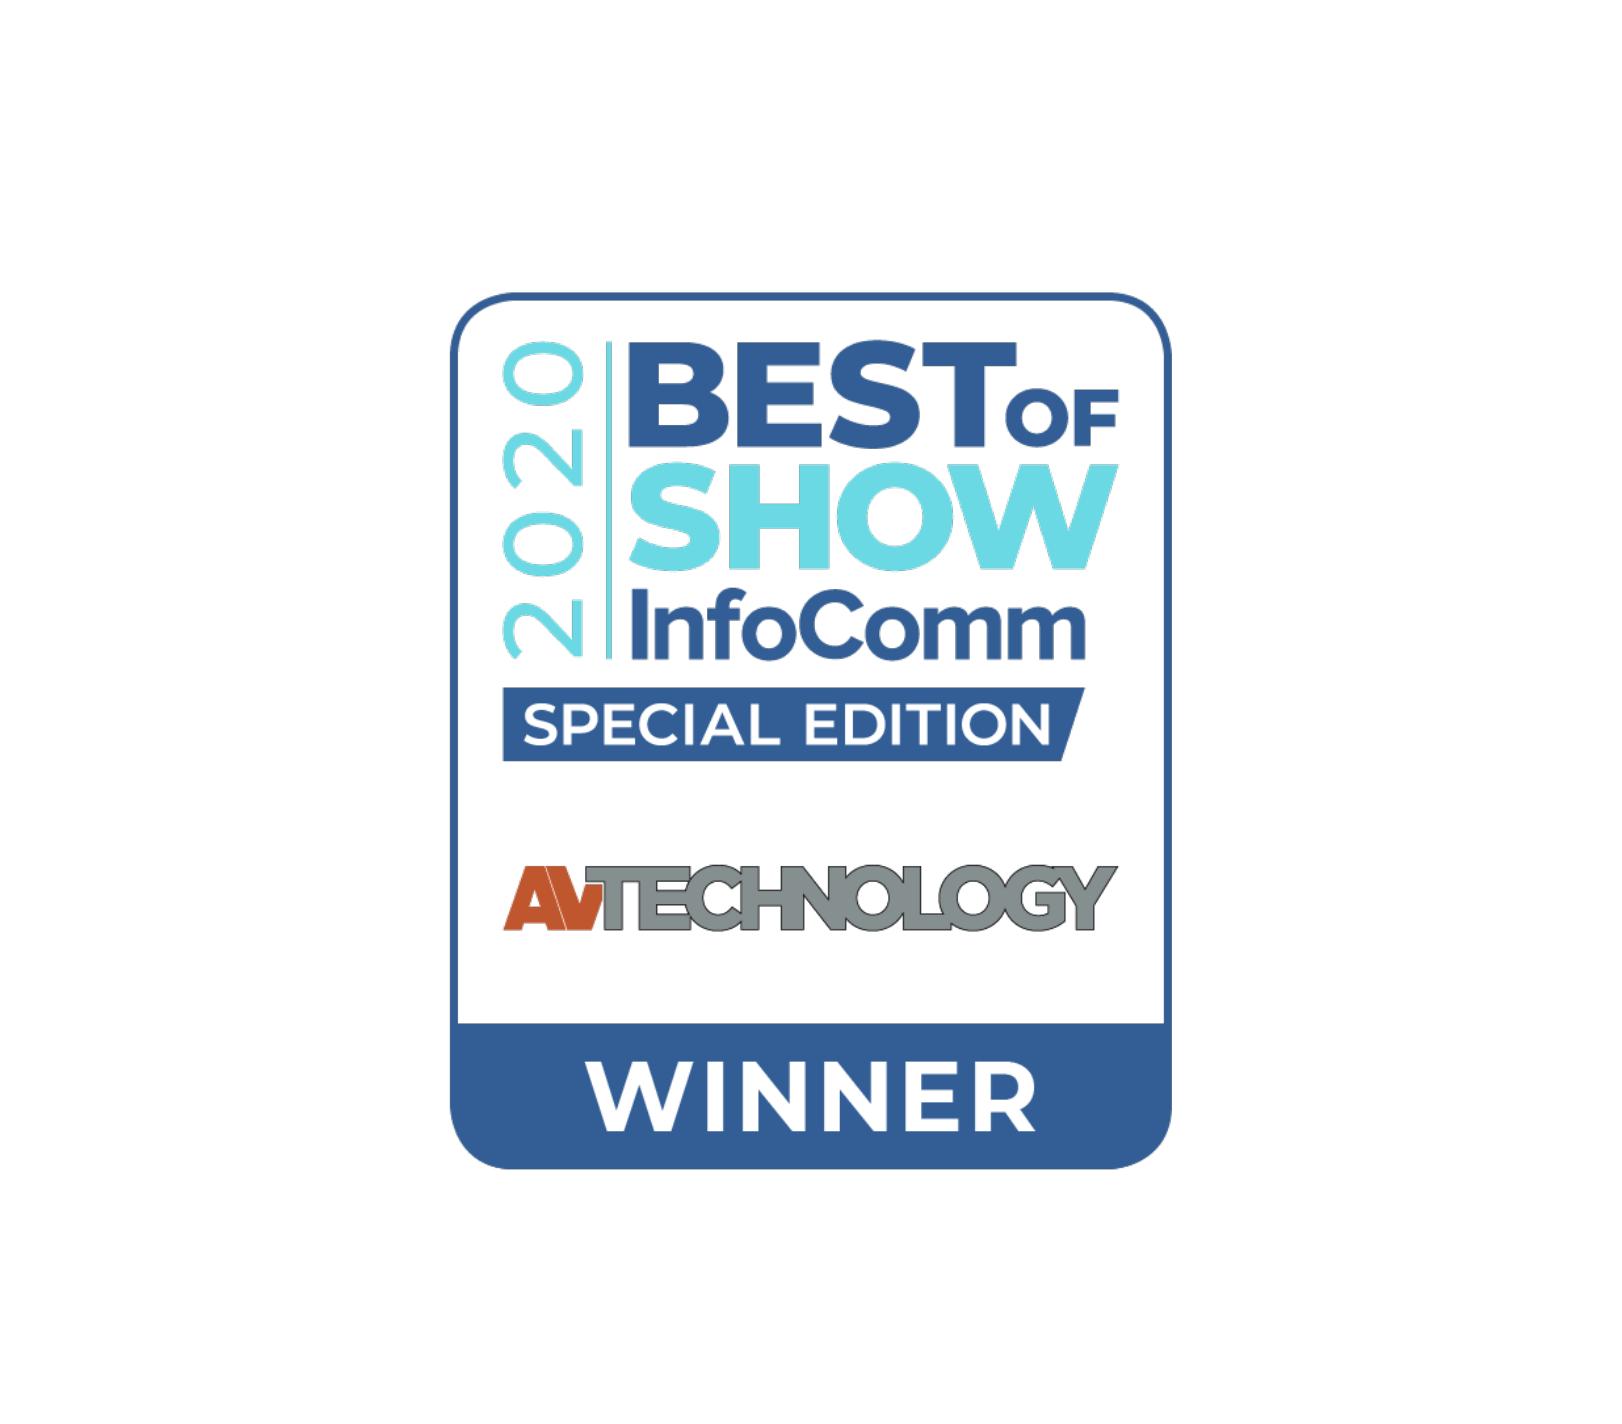 Dynamic4 de Arthur Holm gana el premio Best of Show, presentado por AV Technology